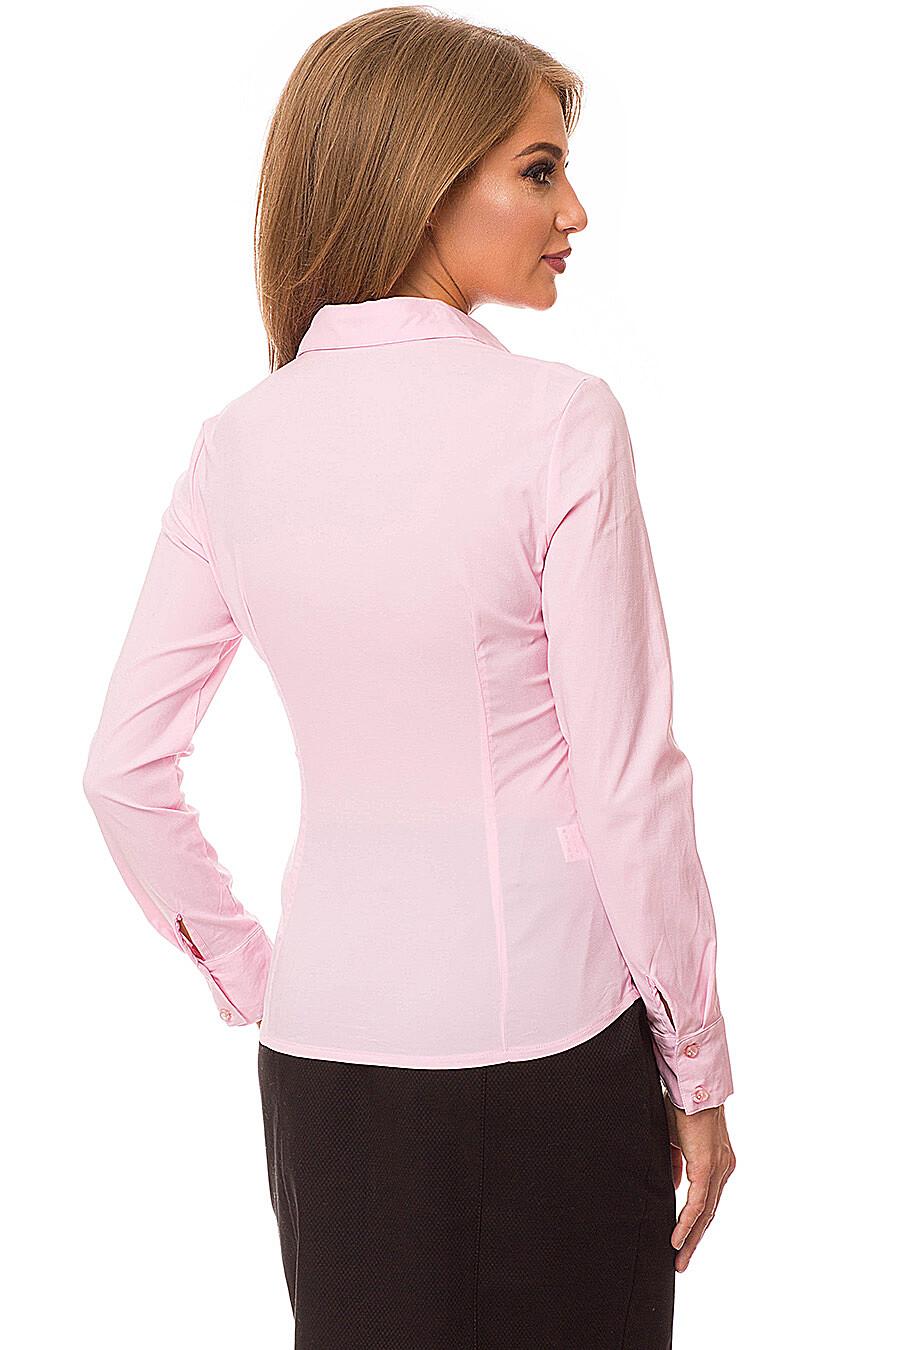 Рубашка MODALIME (86371), купить в Moyo.moda